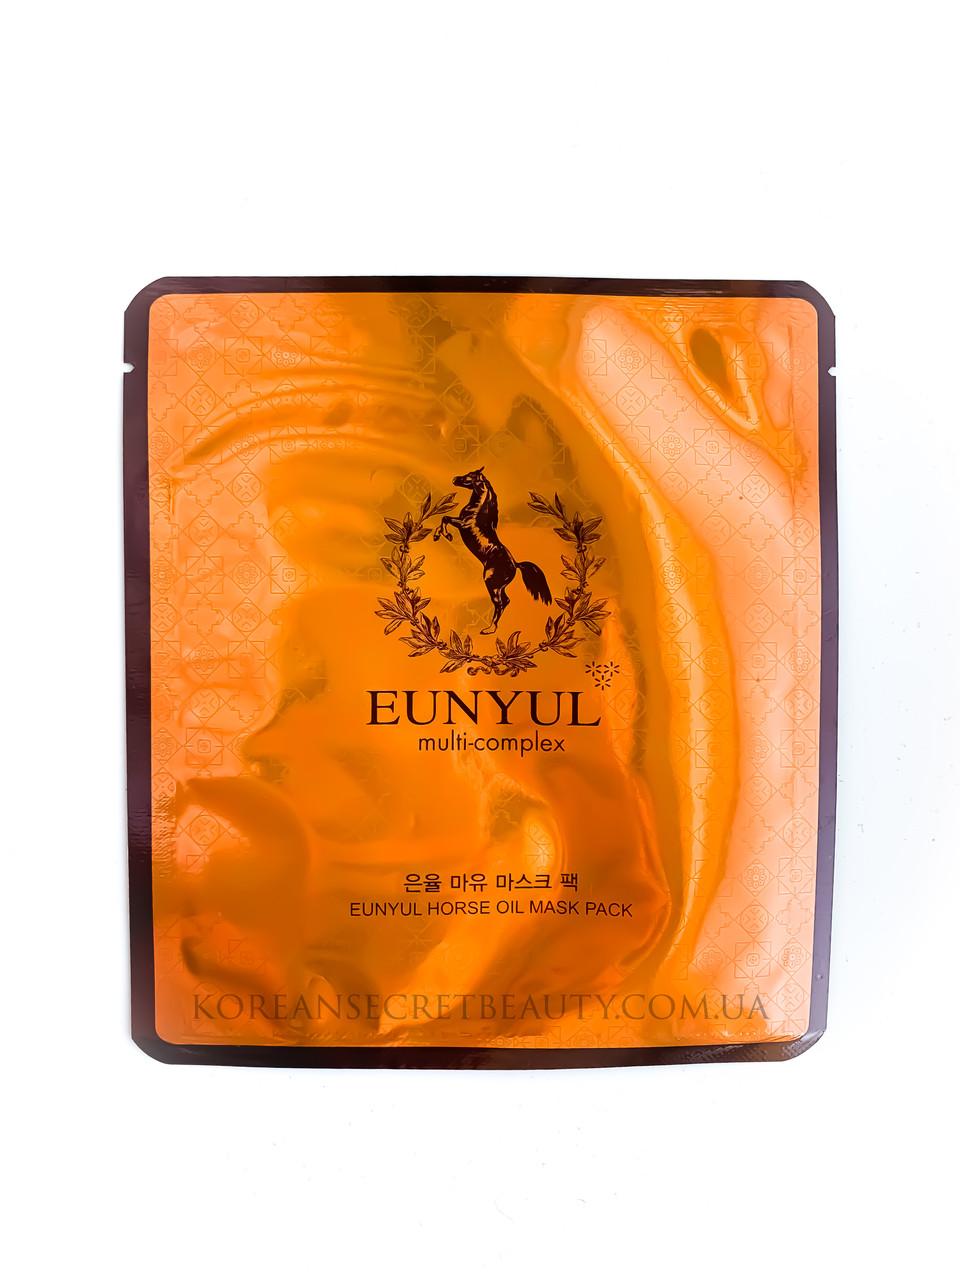 Омолоджуюча тканинна маска з кінським жиром Eunyul Horse Oil mask pack